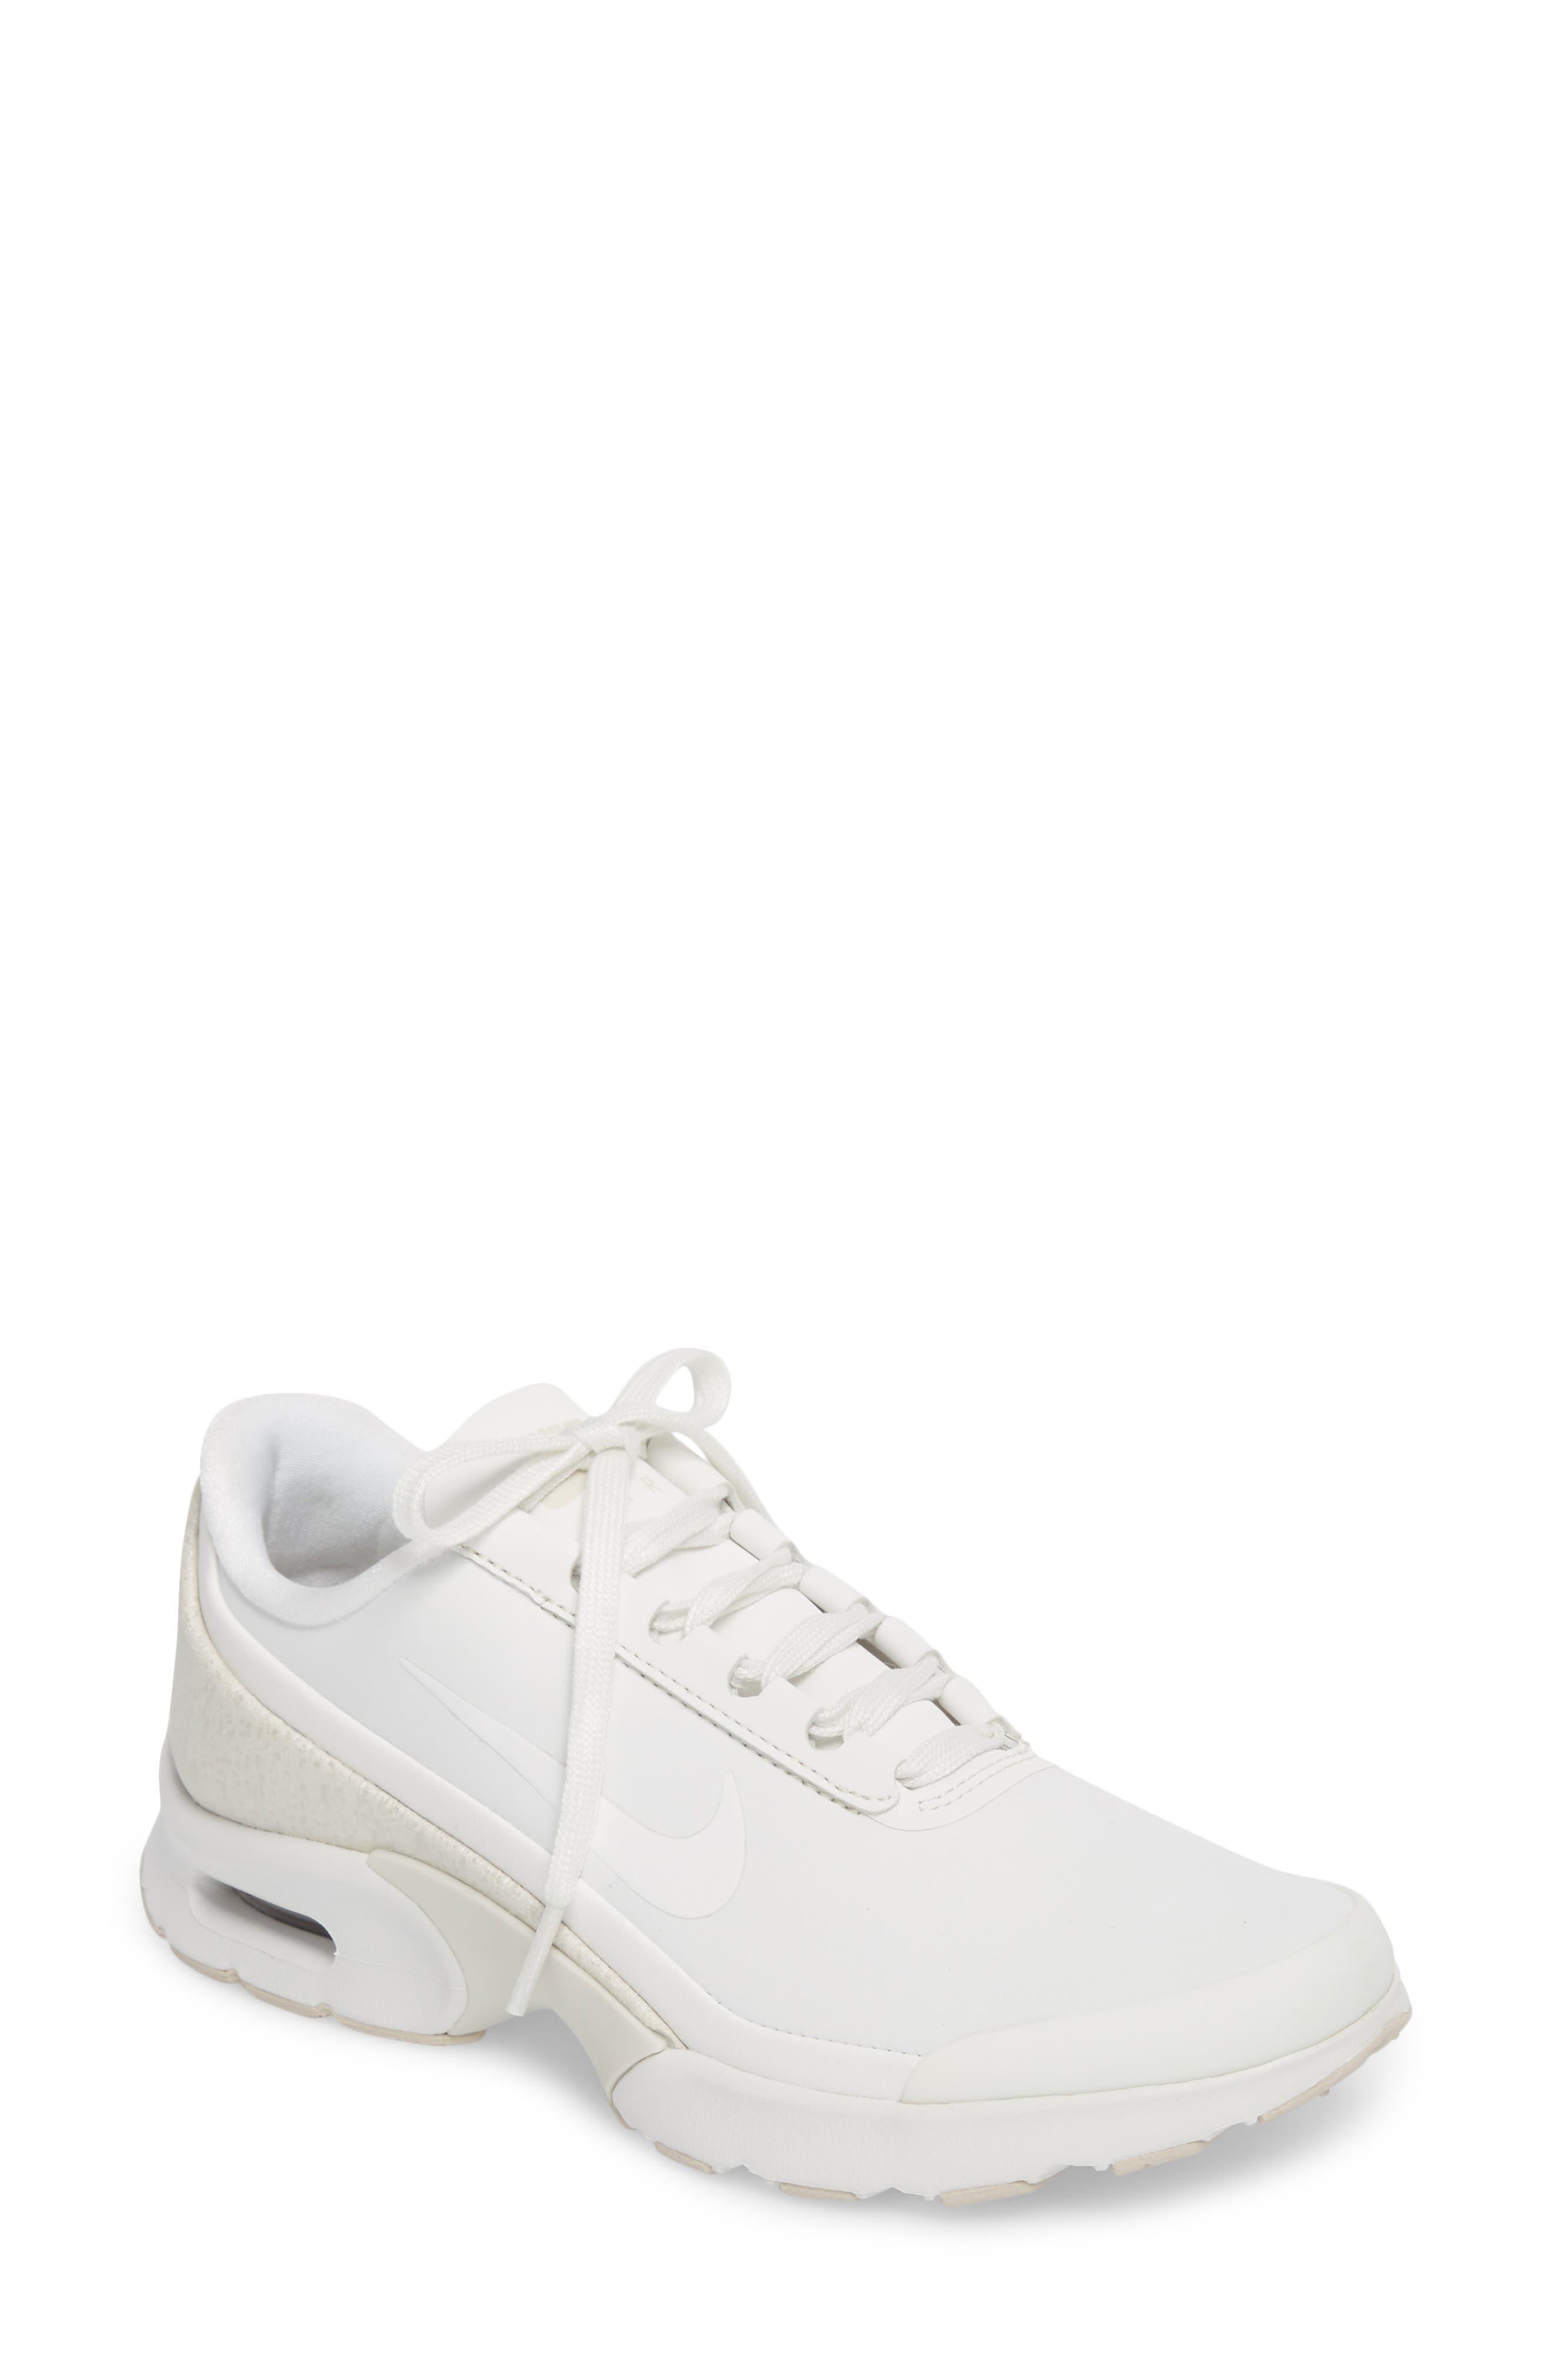 Air Max Jewell Sneaker,                             Main thumbnail 1, color,                             100